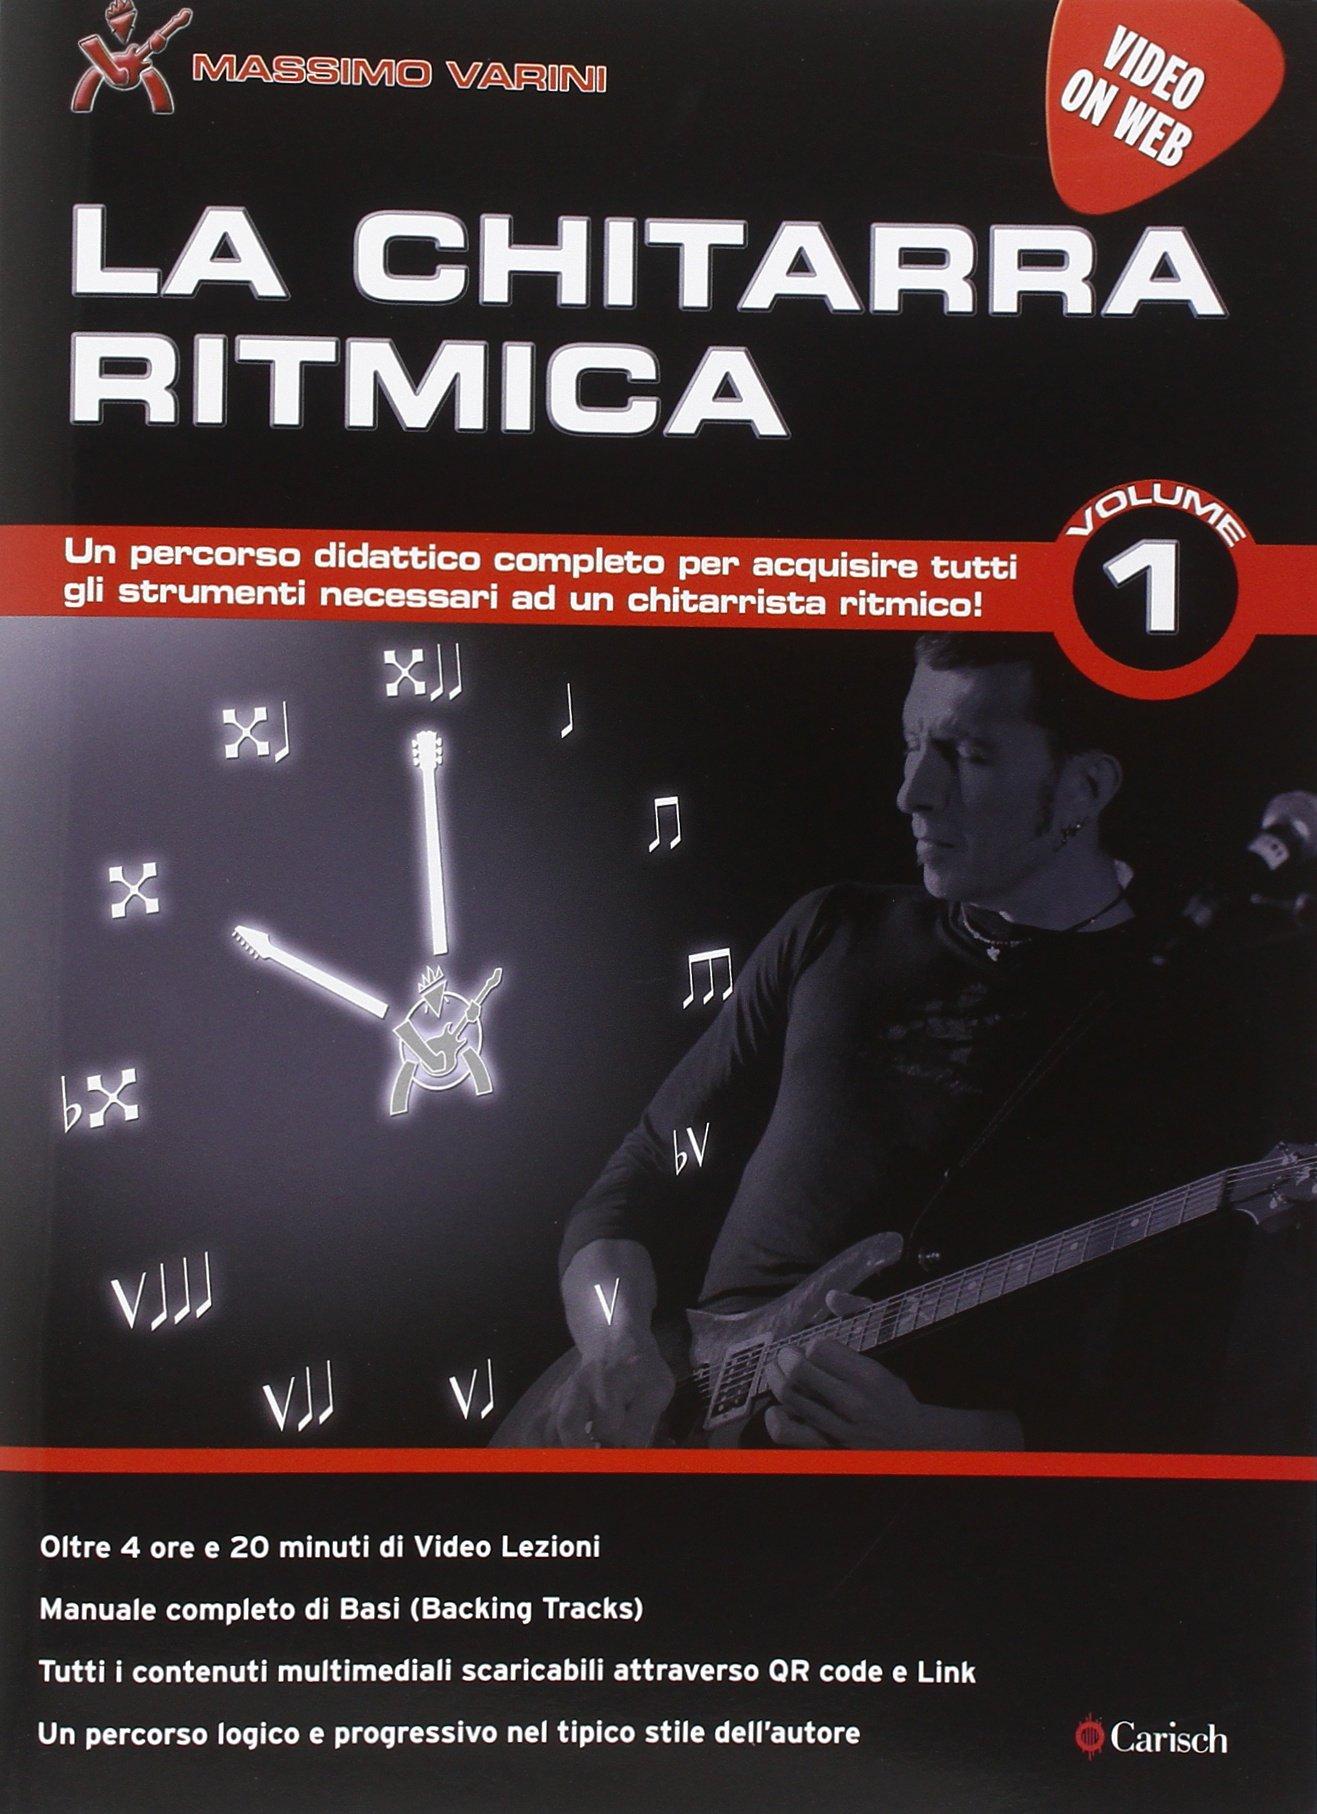 la chitarra ritmica massimo varini